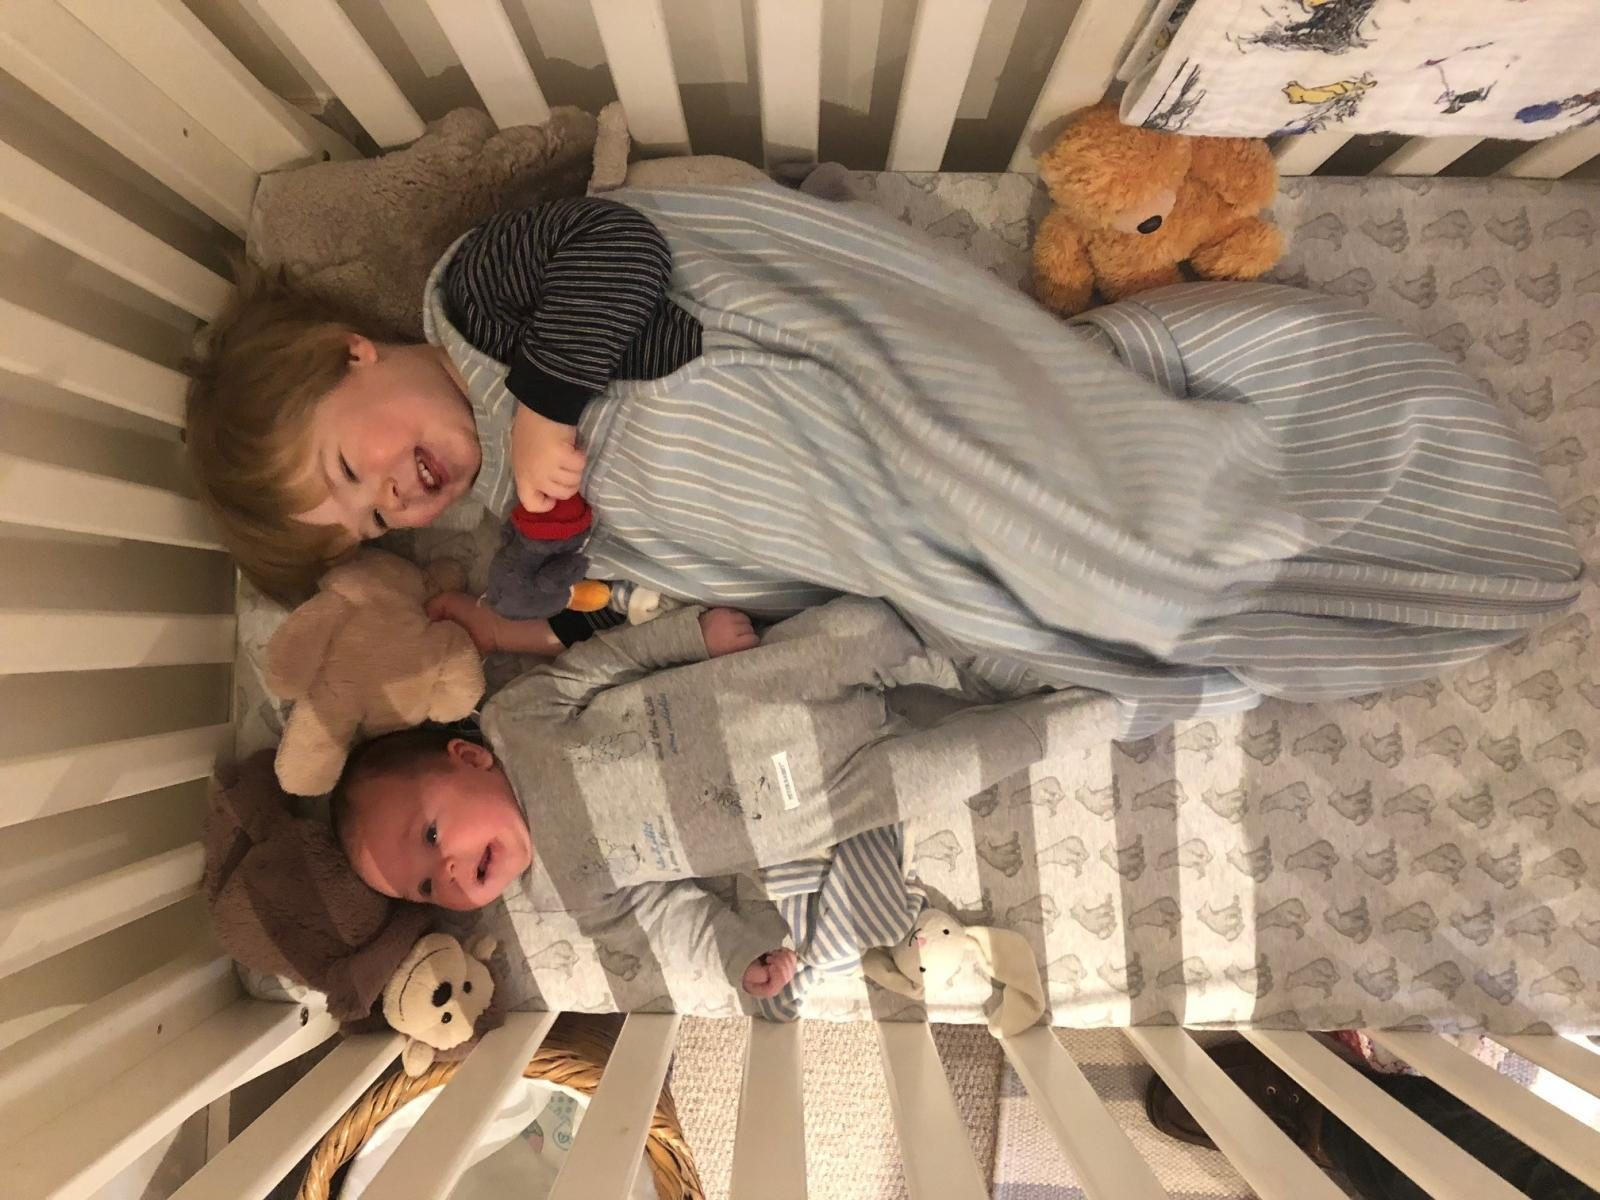 New mum diary - juggling two babies